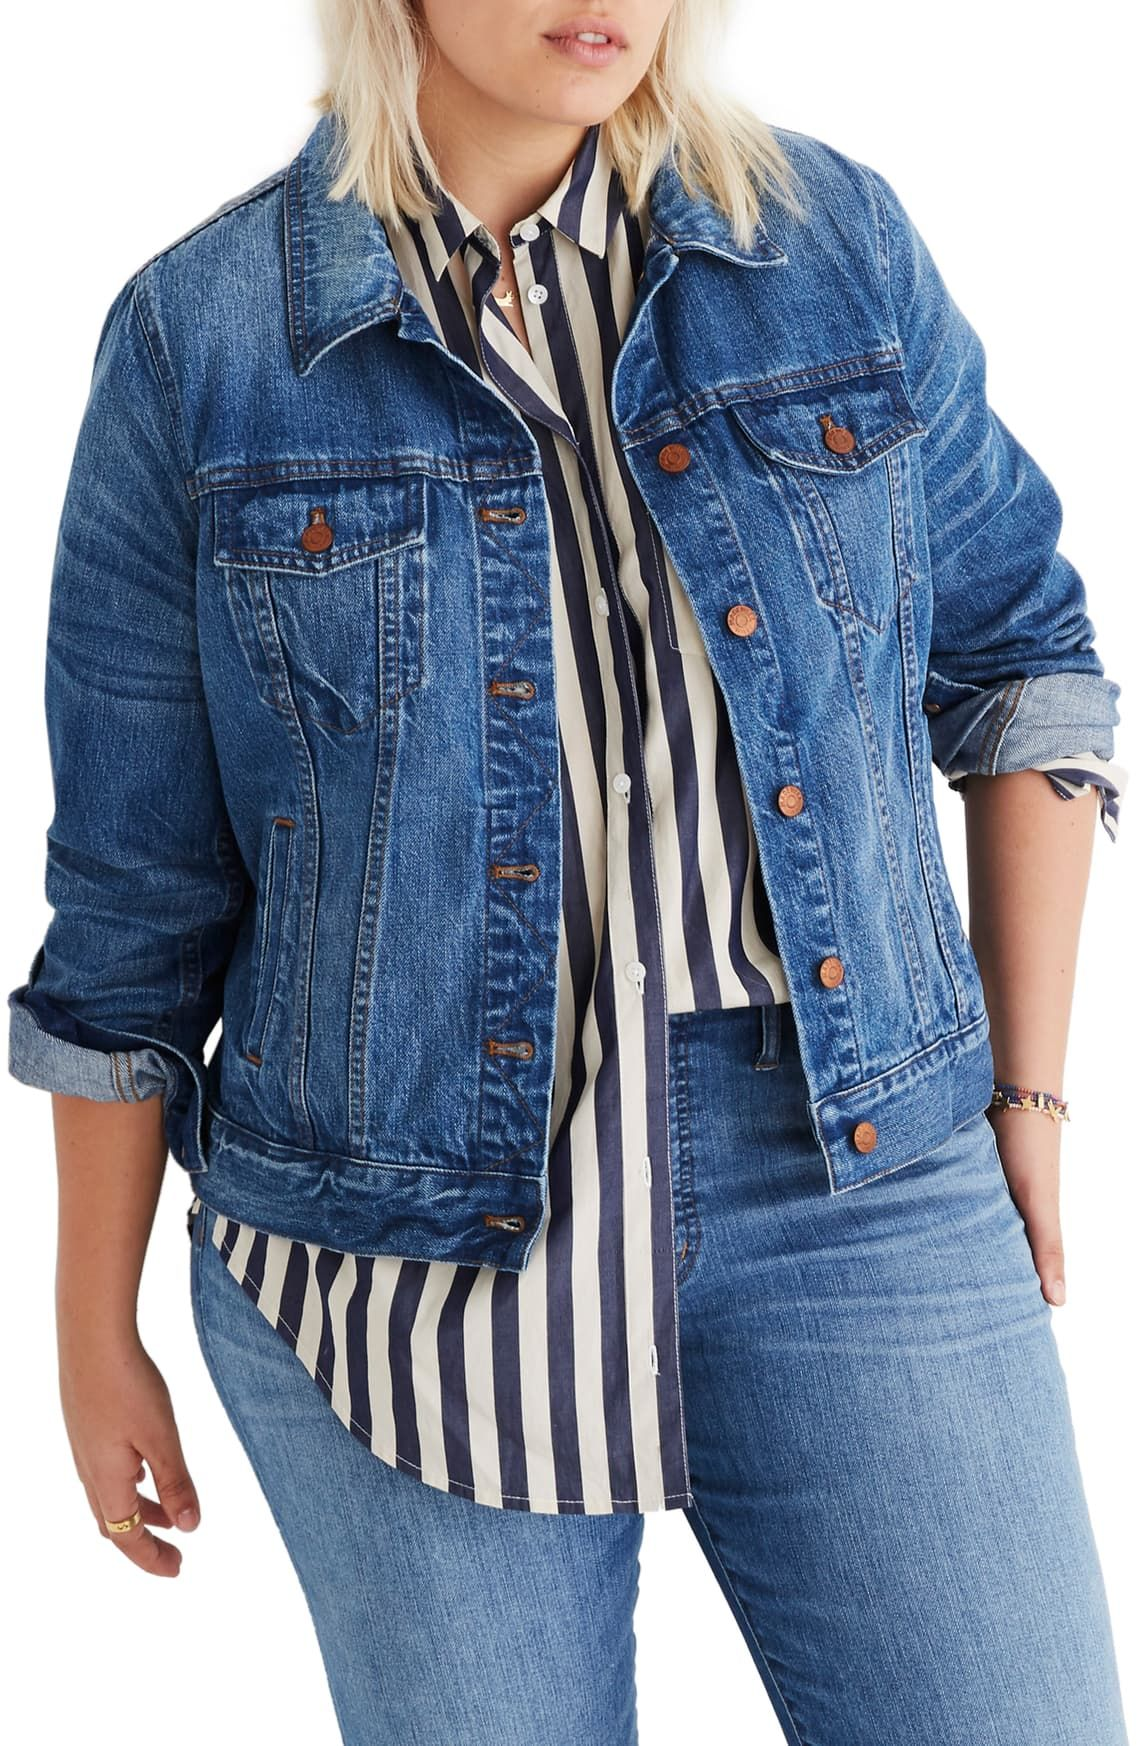 Madewell Denim Jacket Regular Plus Size Nordstrom In 2021 Madewell Denim Jacket Denim Jacket Classic Denim Jacket [ 1746 x 1140 Pixel ]